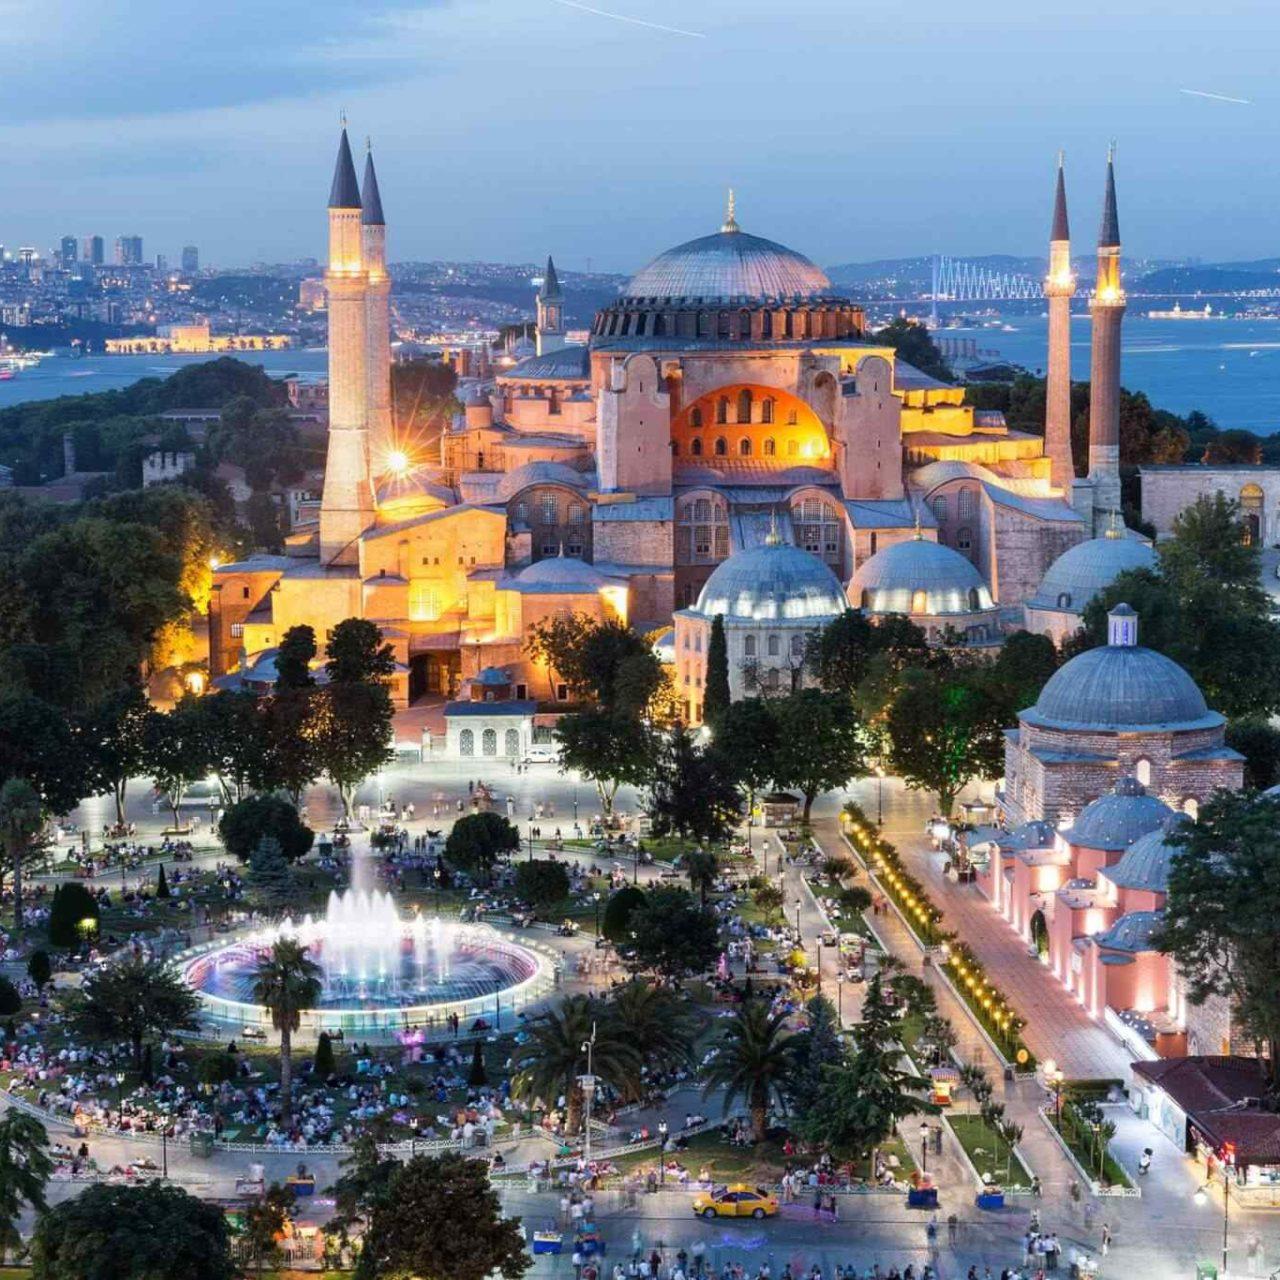 https://www.lukart.cz/wp-content/uploads/2018/09/destination-istanbul-02-1280x1280.jpg